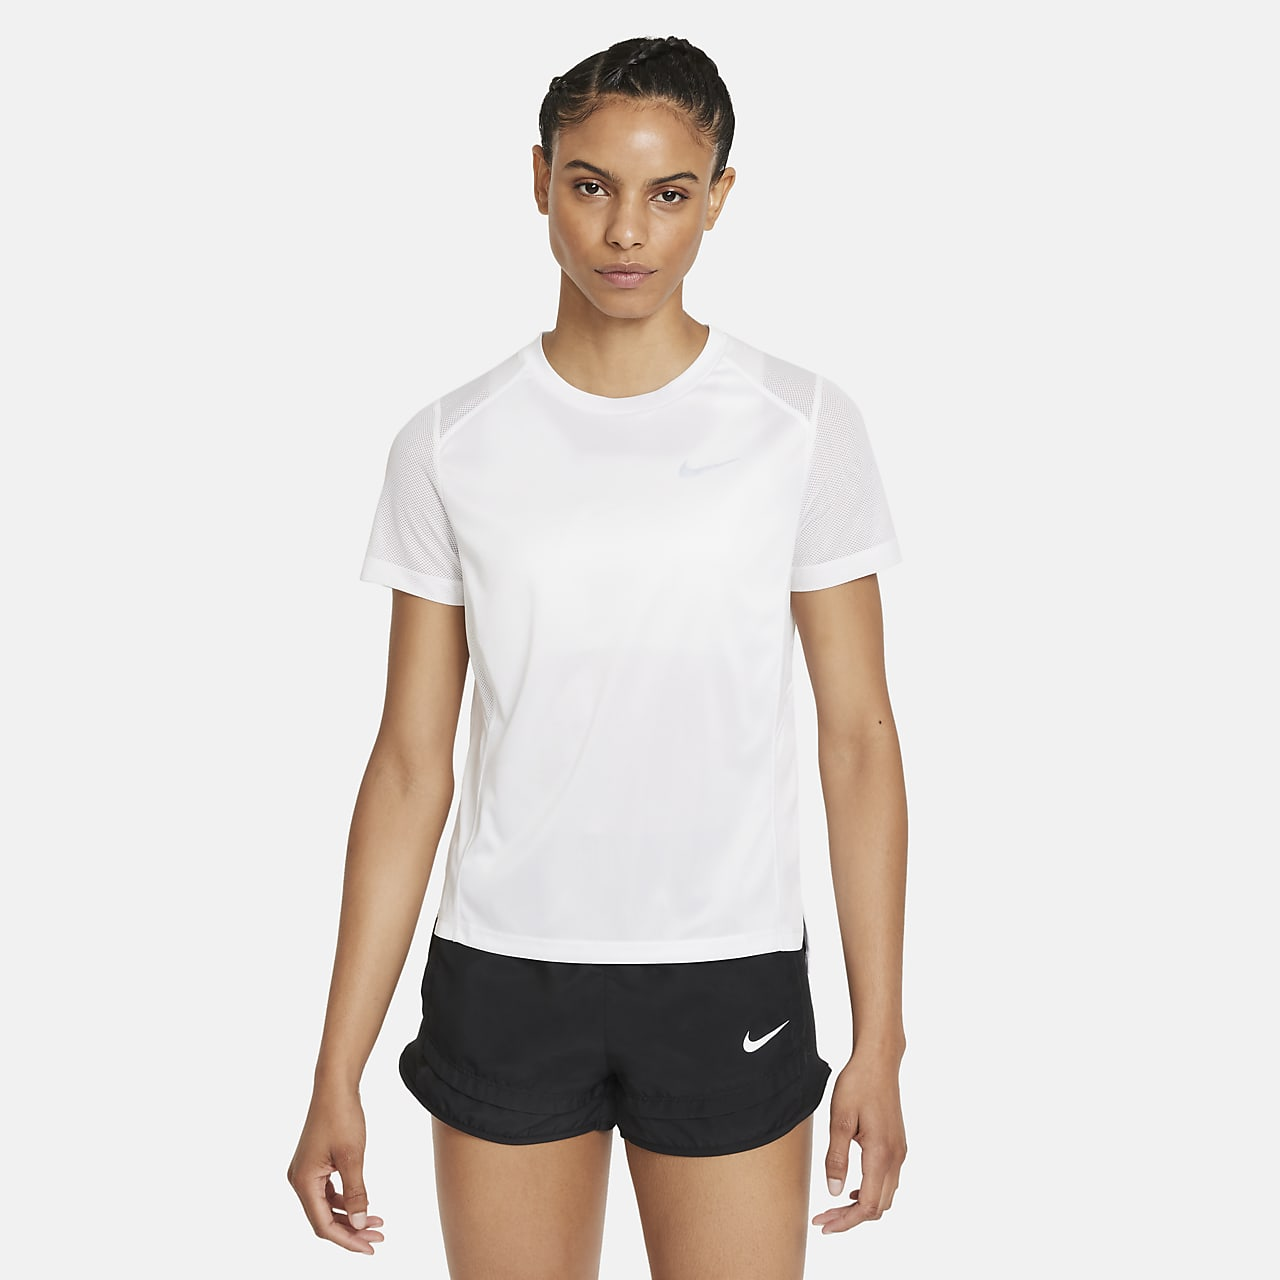 Nike Dri-FIT Miler Women's Running Top